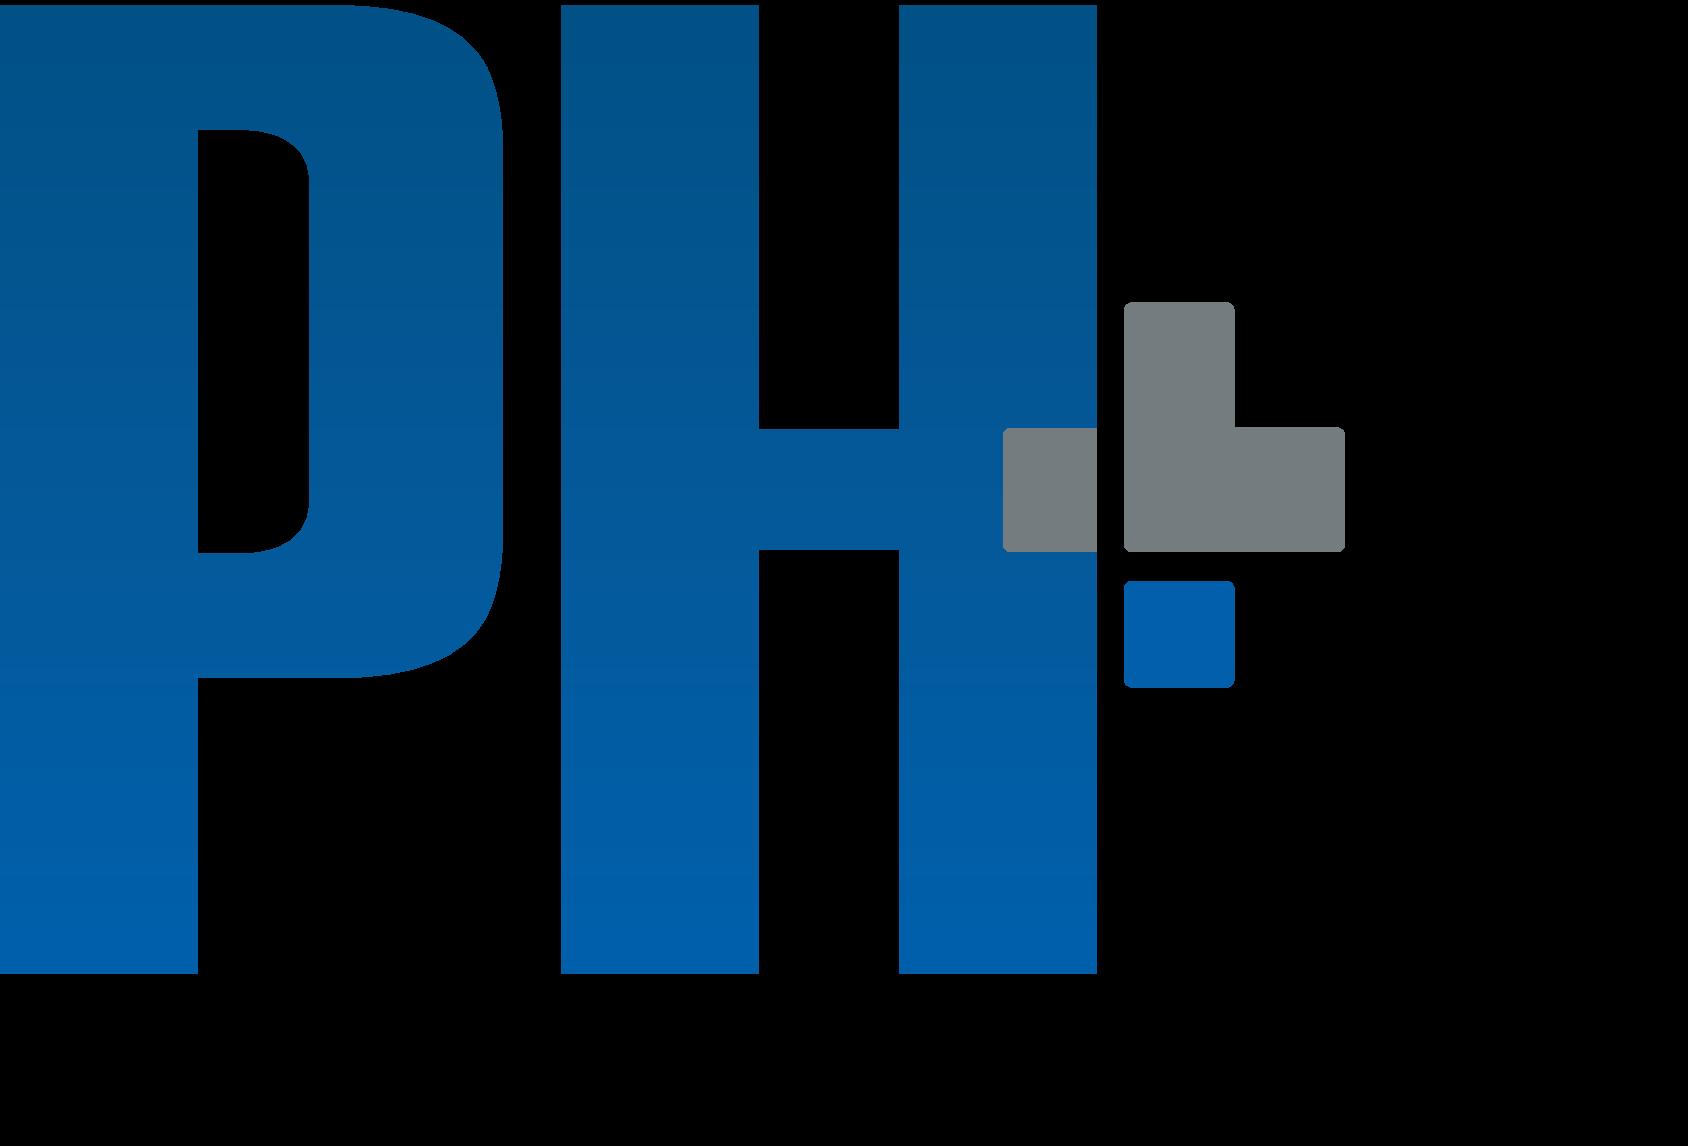 PH+T Digital